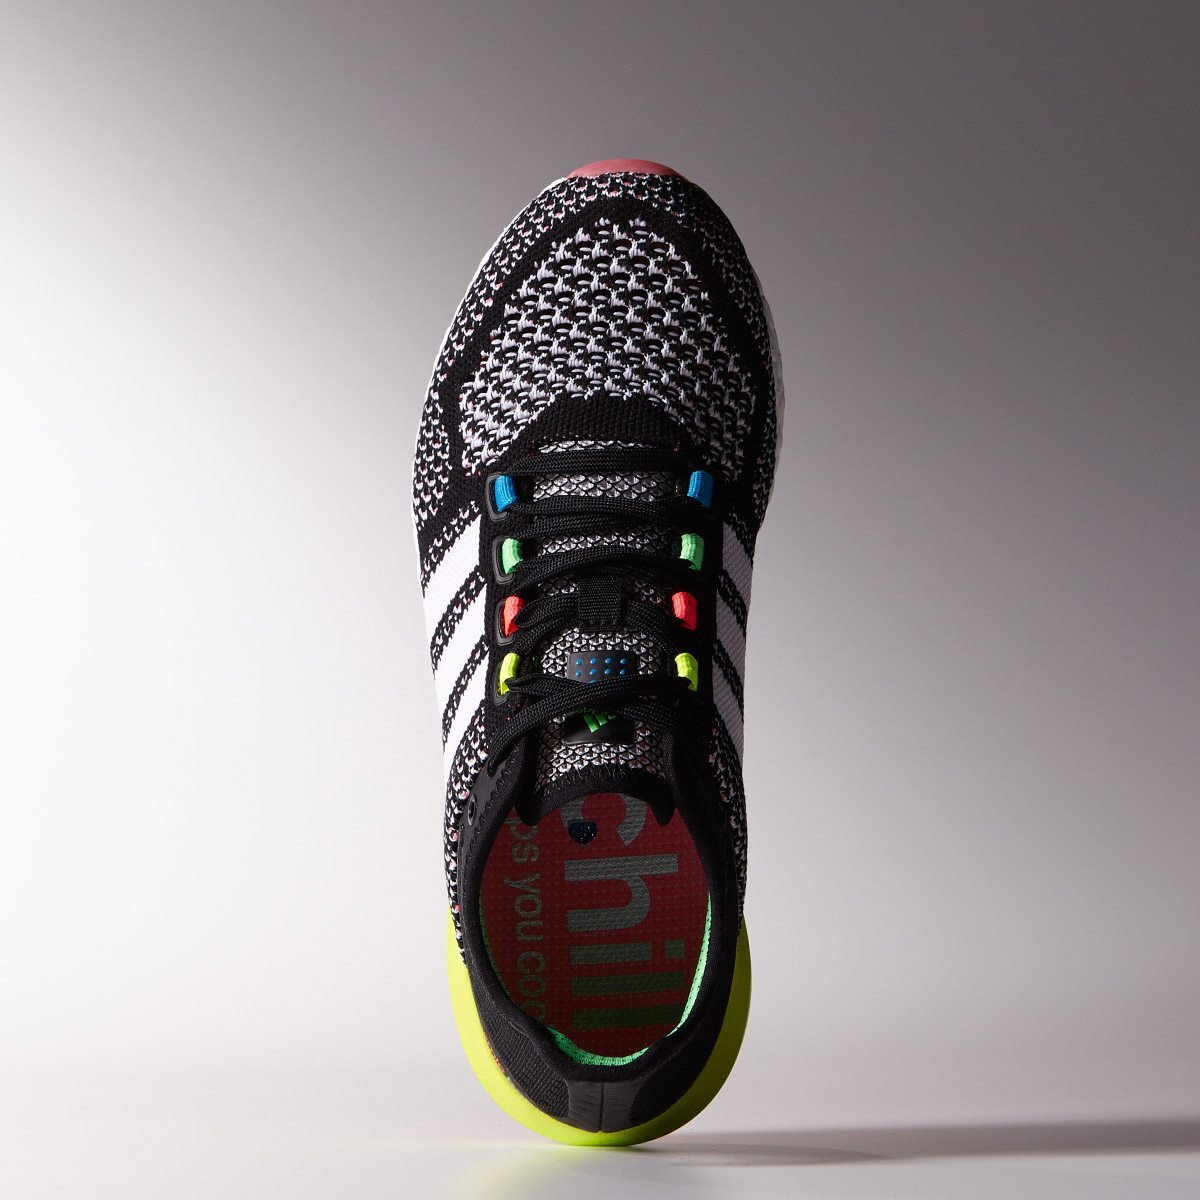 adidas Climachill Cosmic Gazelle Boost 11